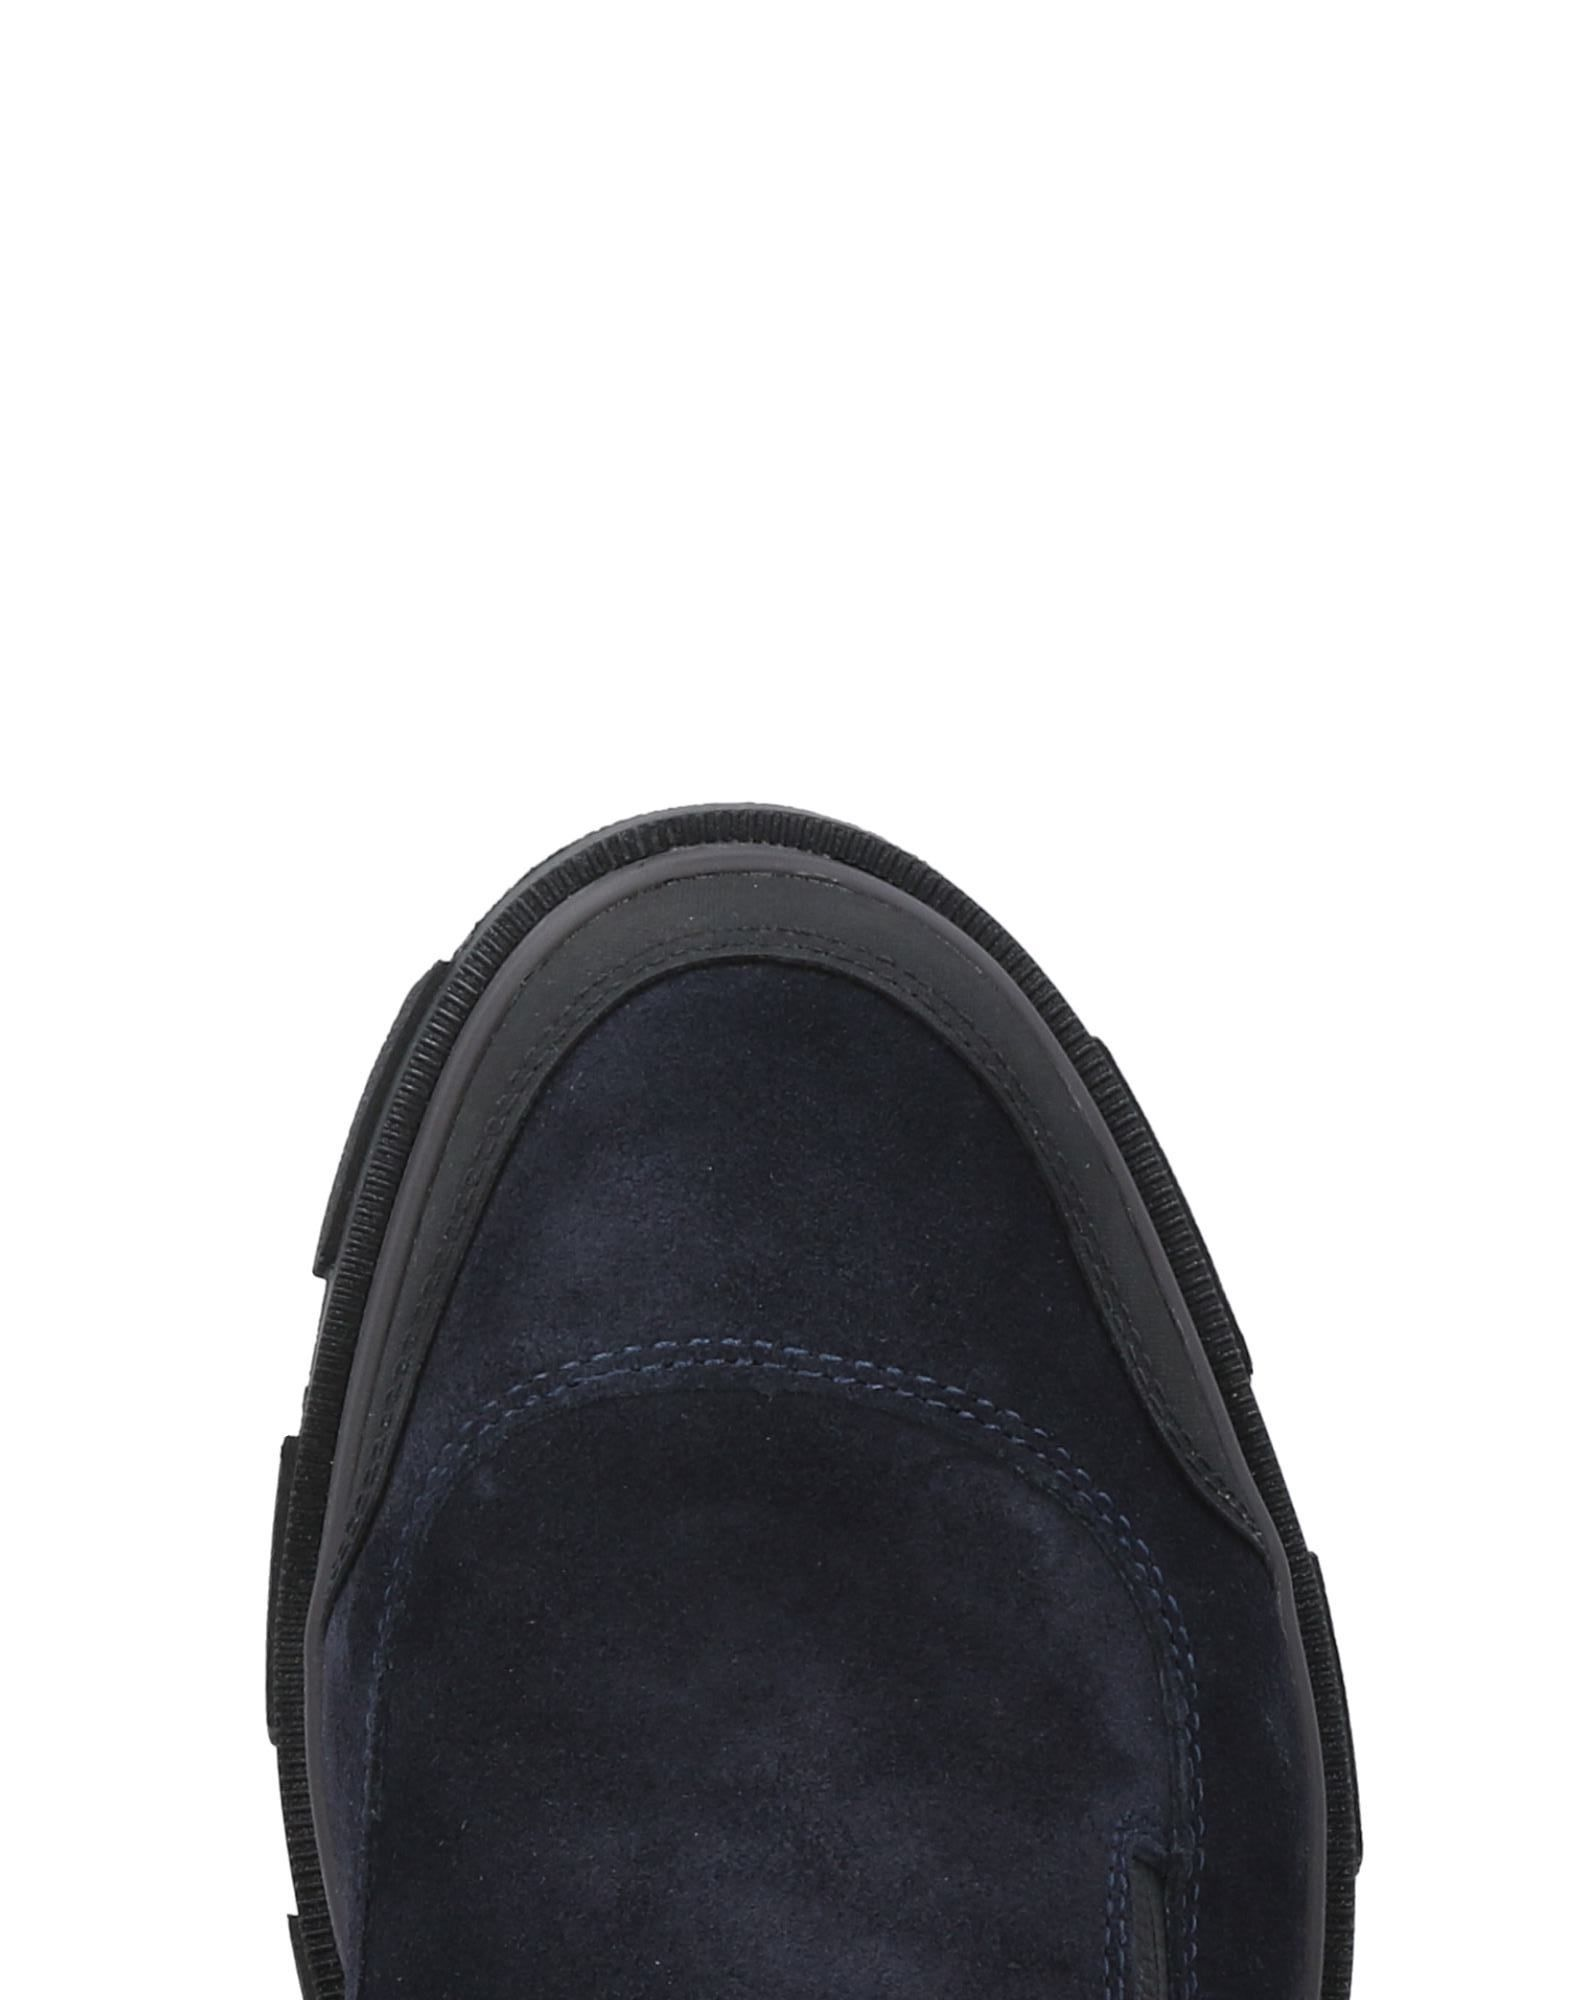 Swims Sneakers Herren  11483783OV 11483783OV  0a6a6c